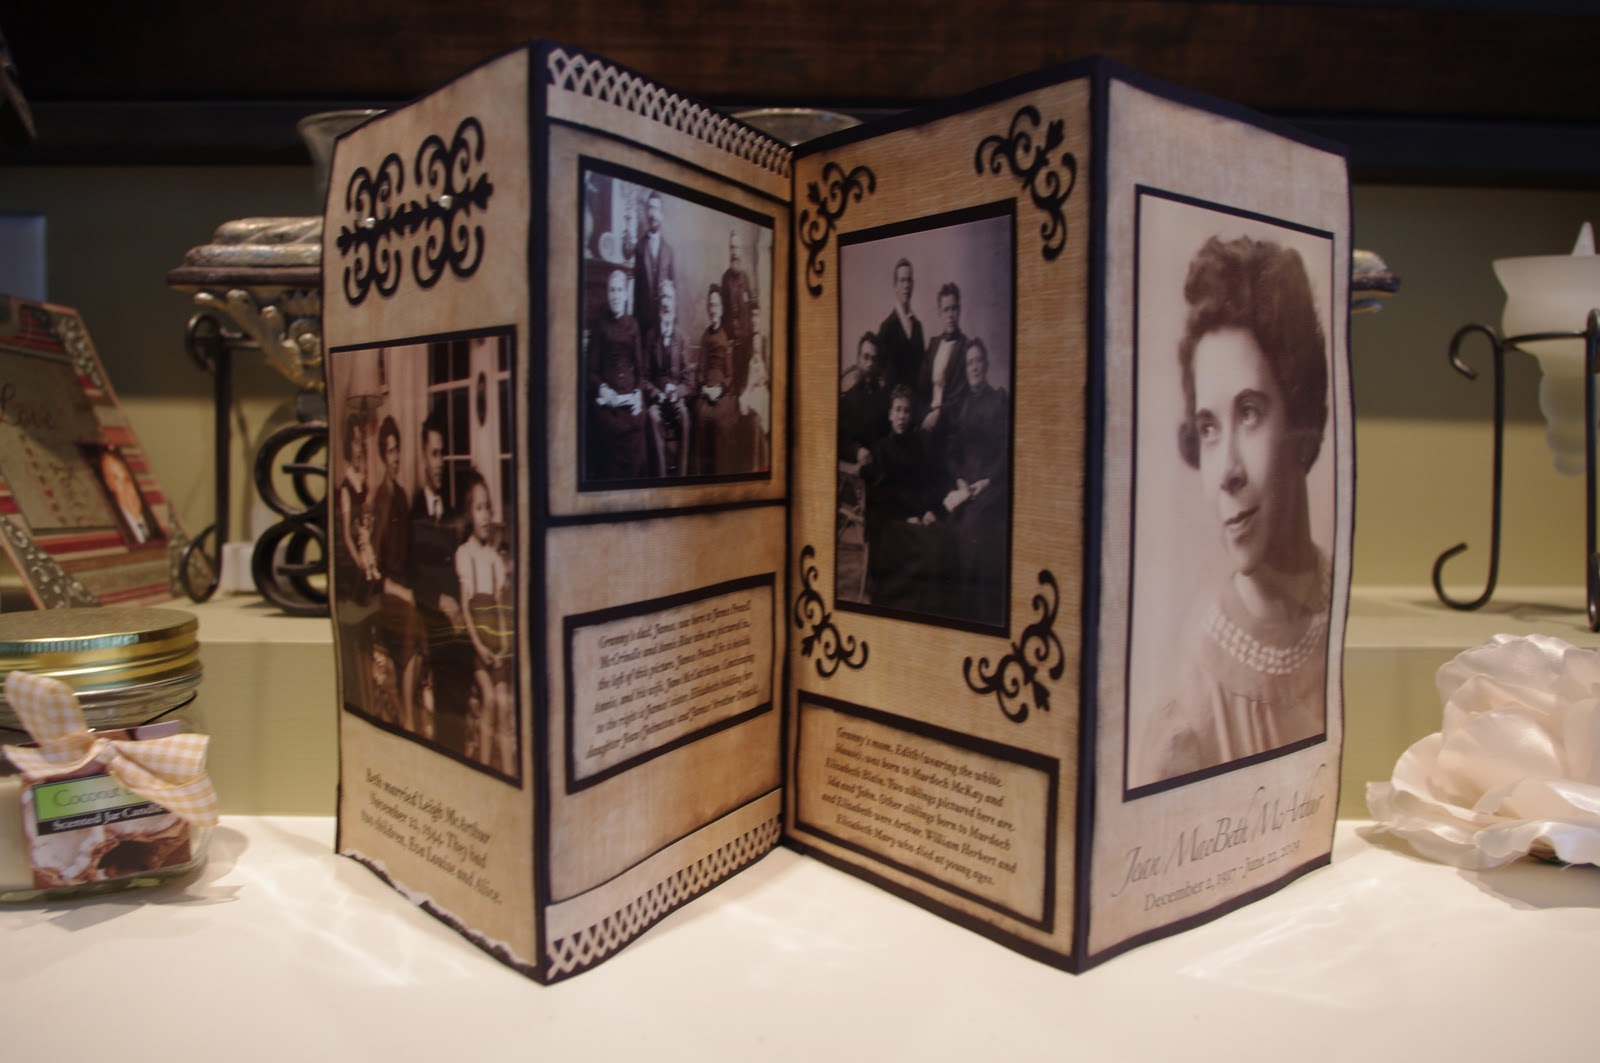 Scrapbook ideas history projects - Family History Gift Idea Accordion Album Tutorial